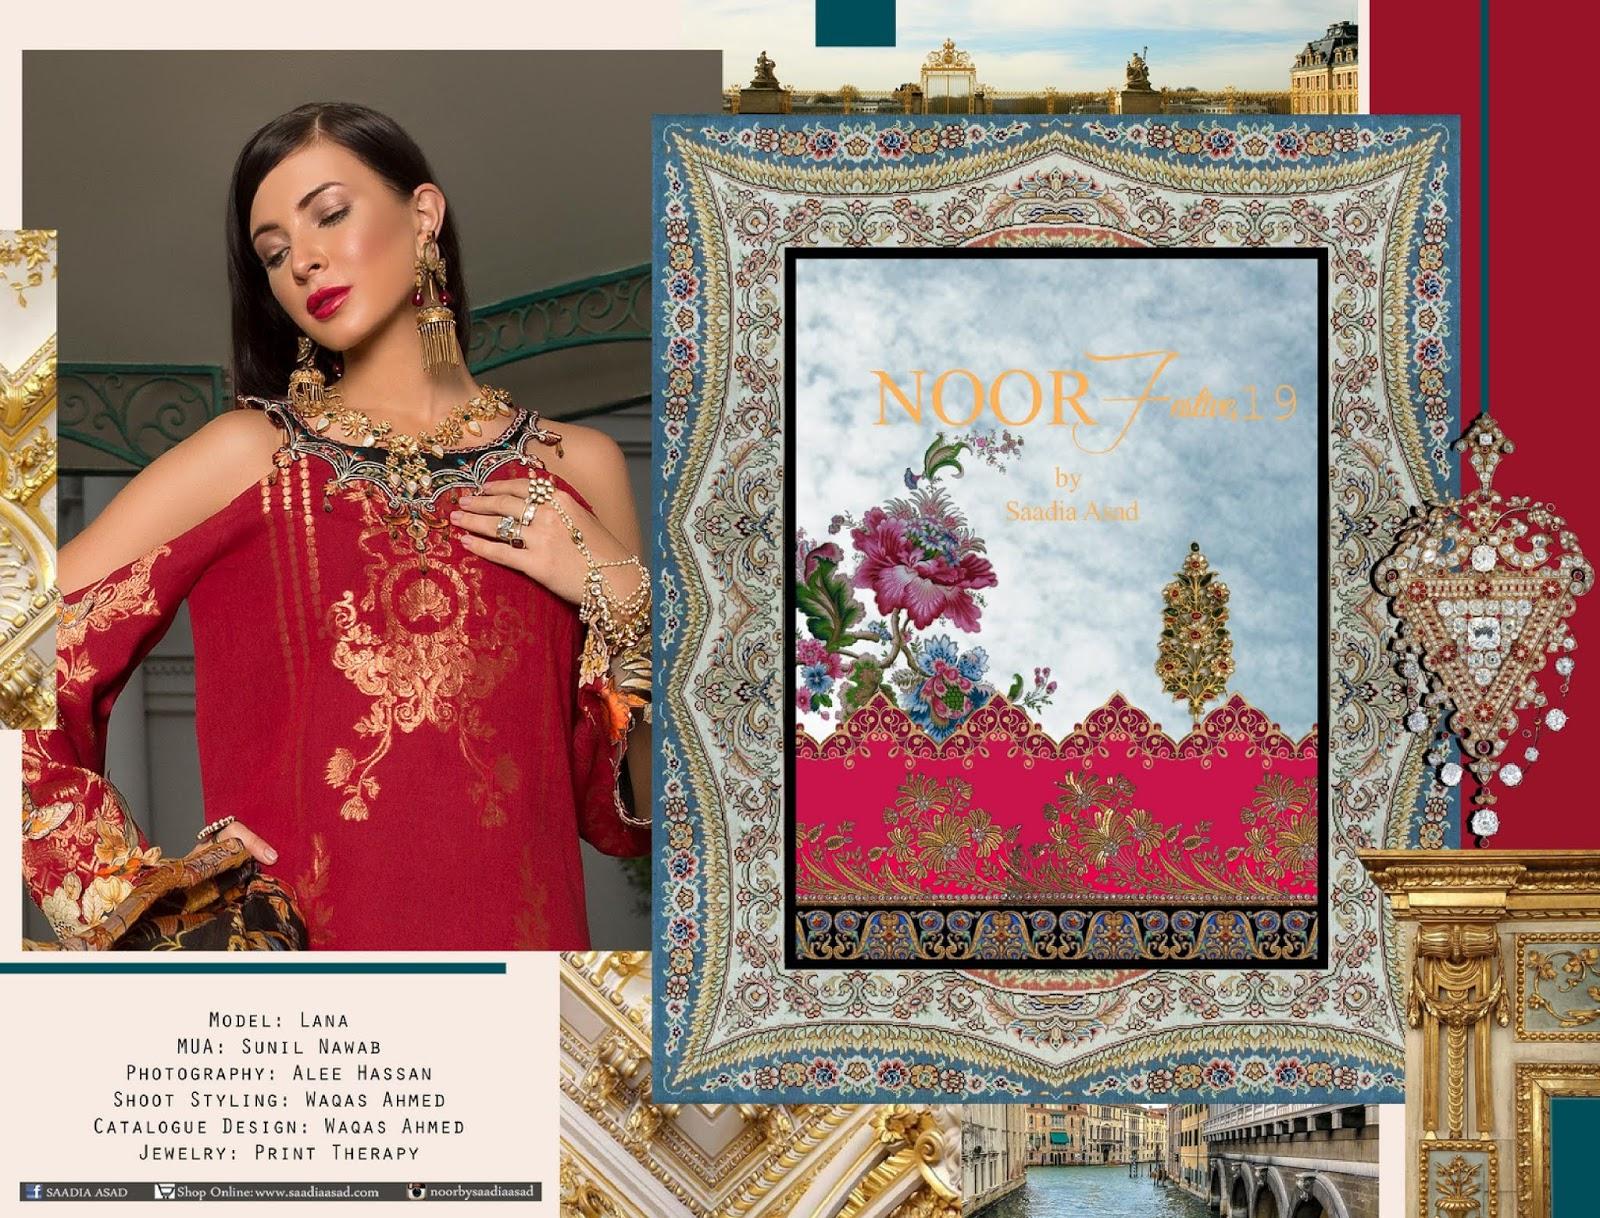 dbaebcaabb 4Seasons Fashion: Noor Festive Luxury Lawn by Saadia Asad 2019